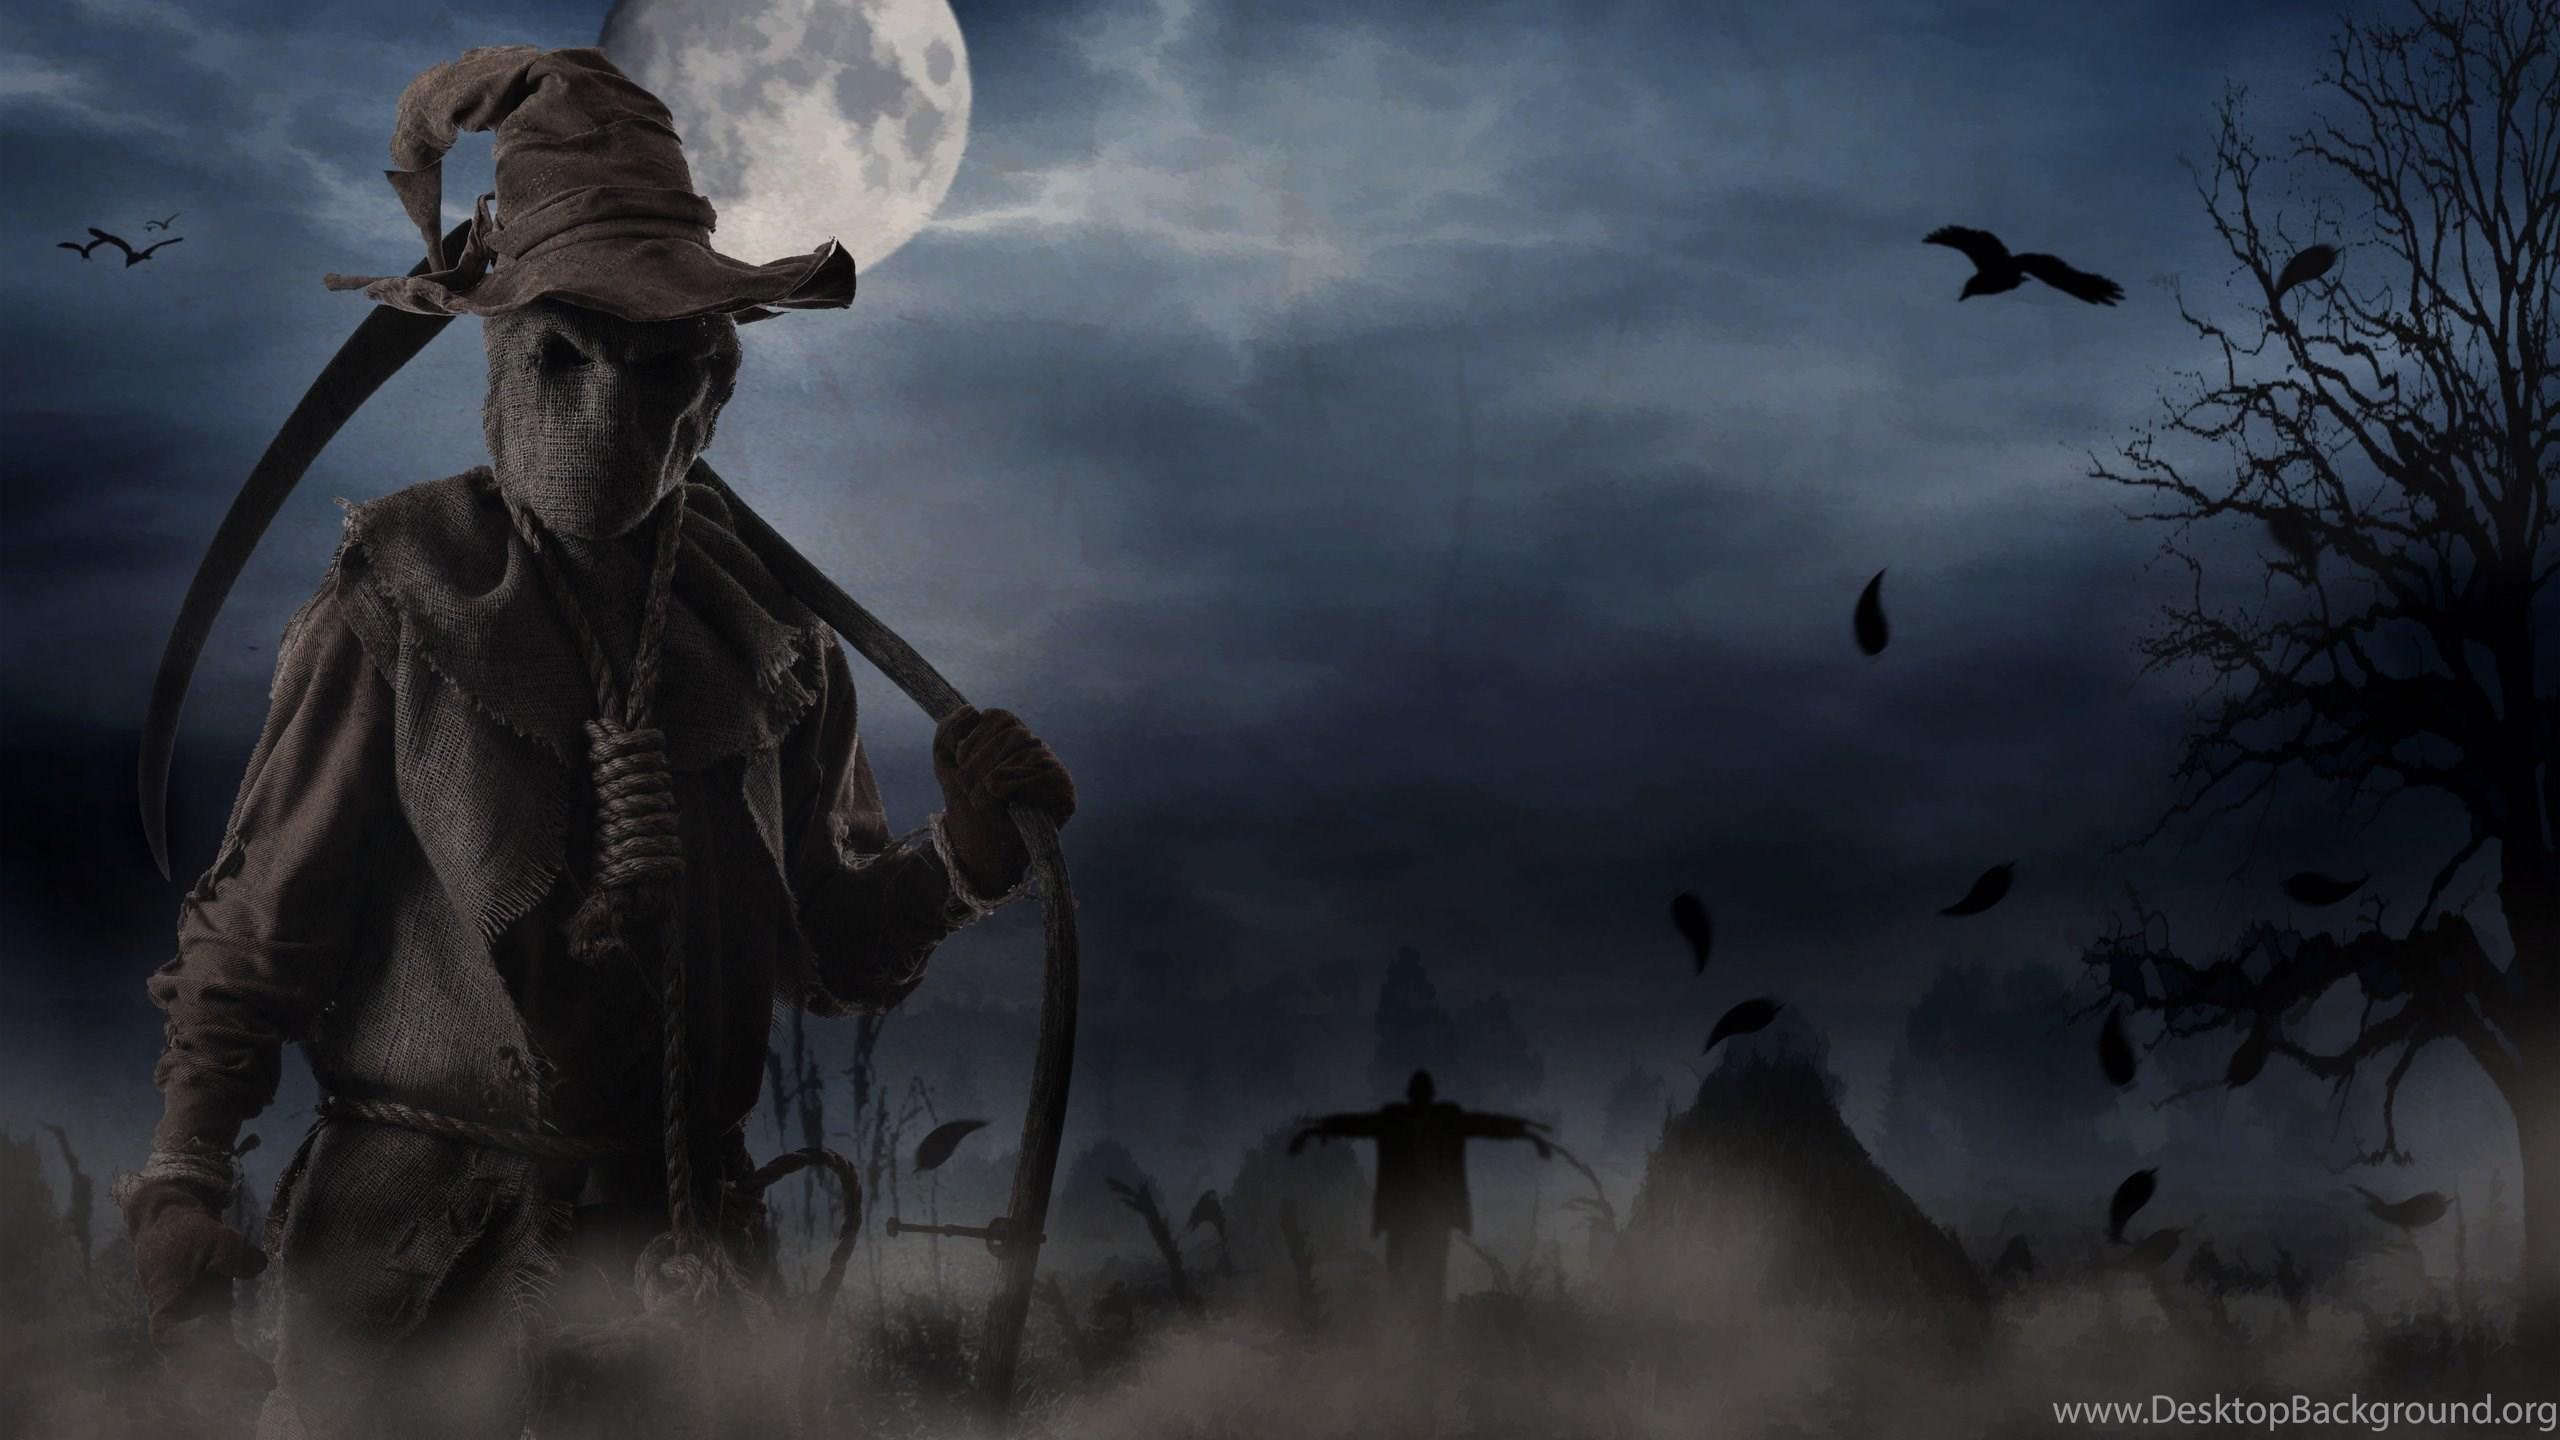 Download Free Hd Horror Wallpapers: 387 Horror HD Wallpapers Desktop Background